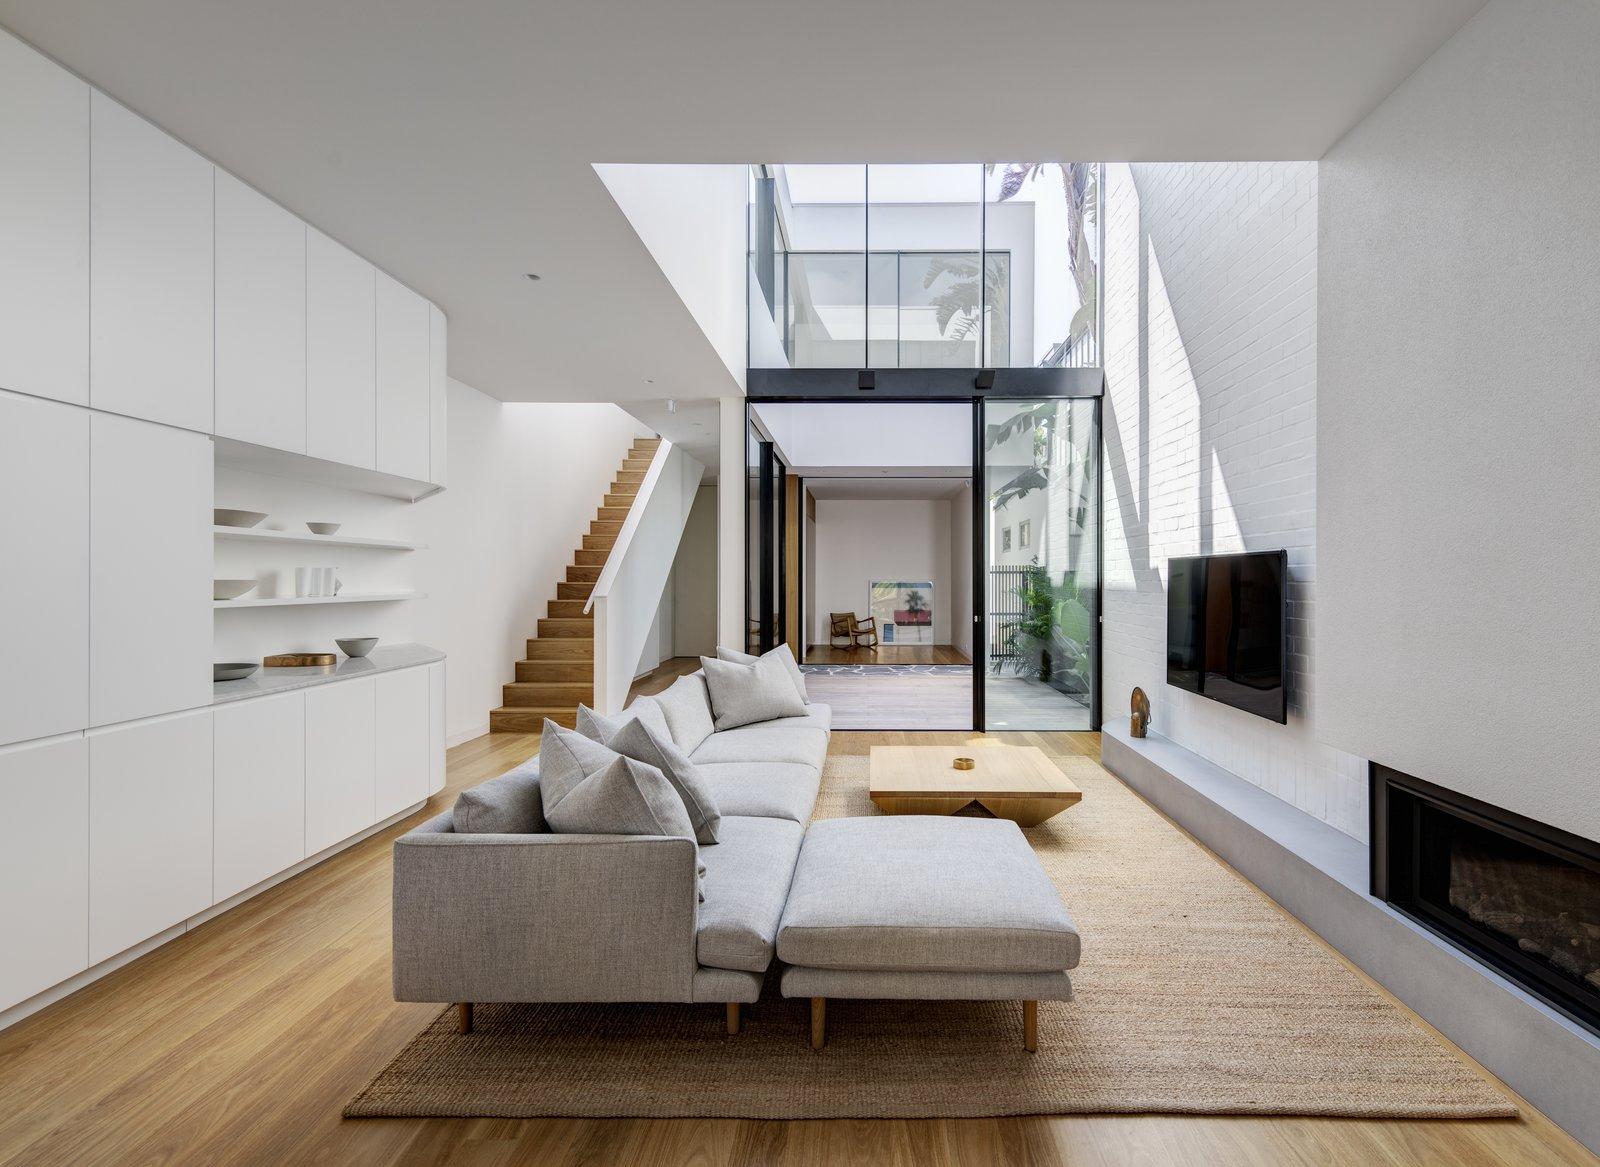 Cloud House living room